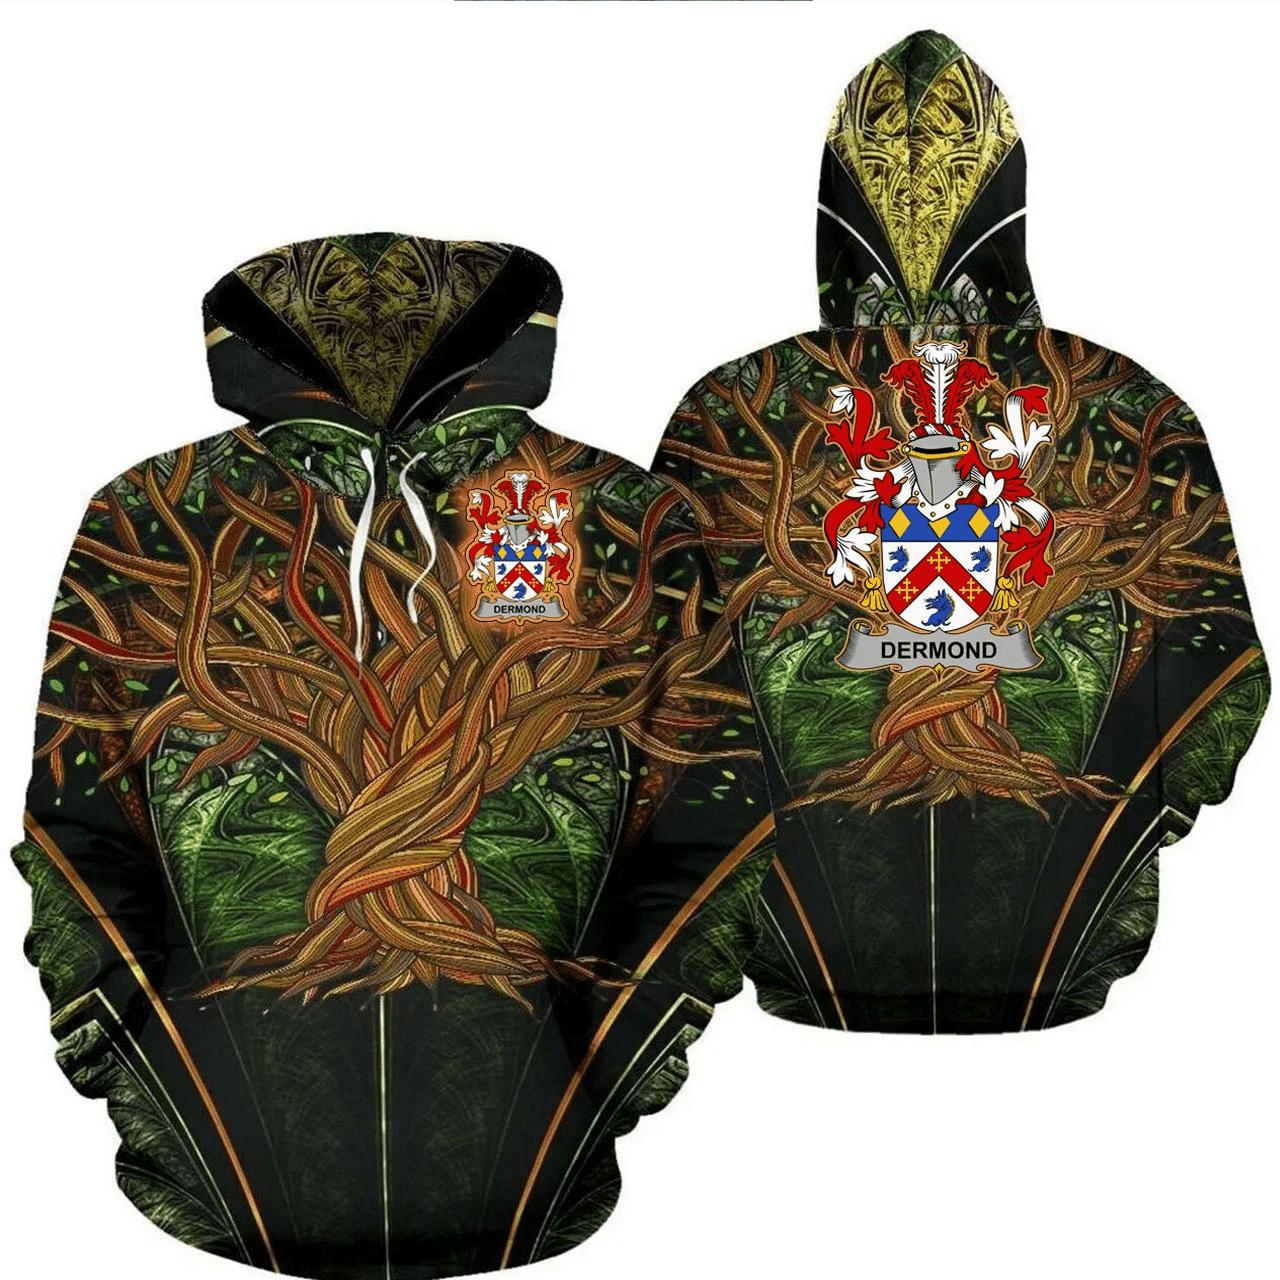 1stIreland Ireland Hoodie - Dermond or O'Dermond Irish Family Crest Hoodie - Tree Of Life A7